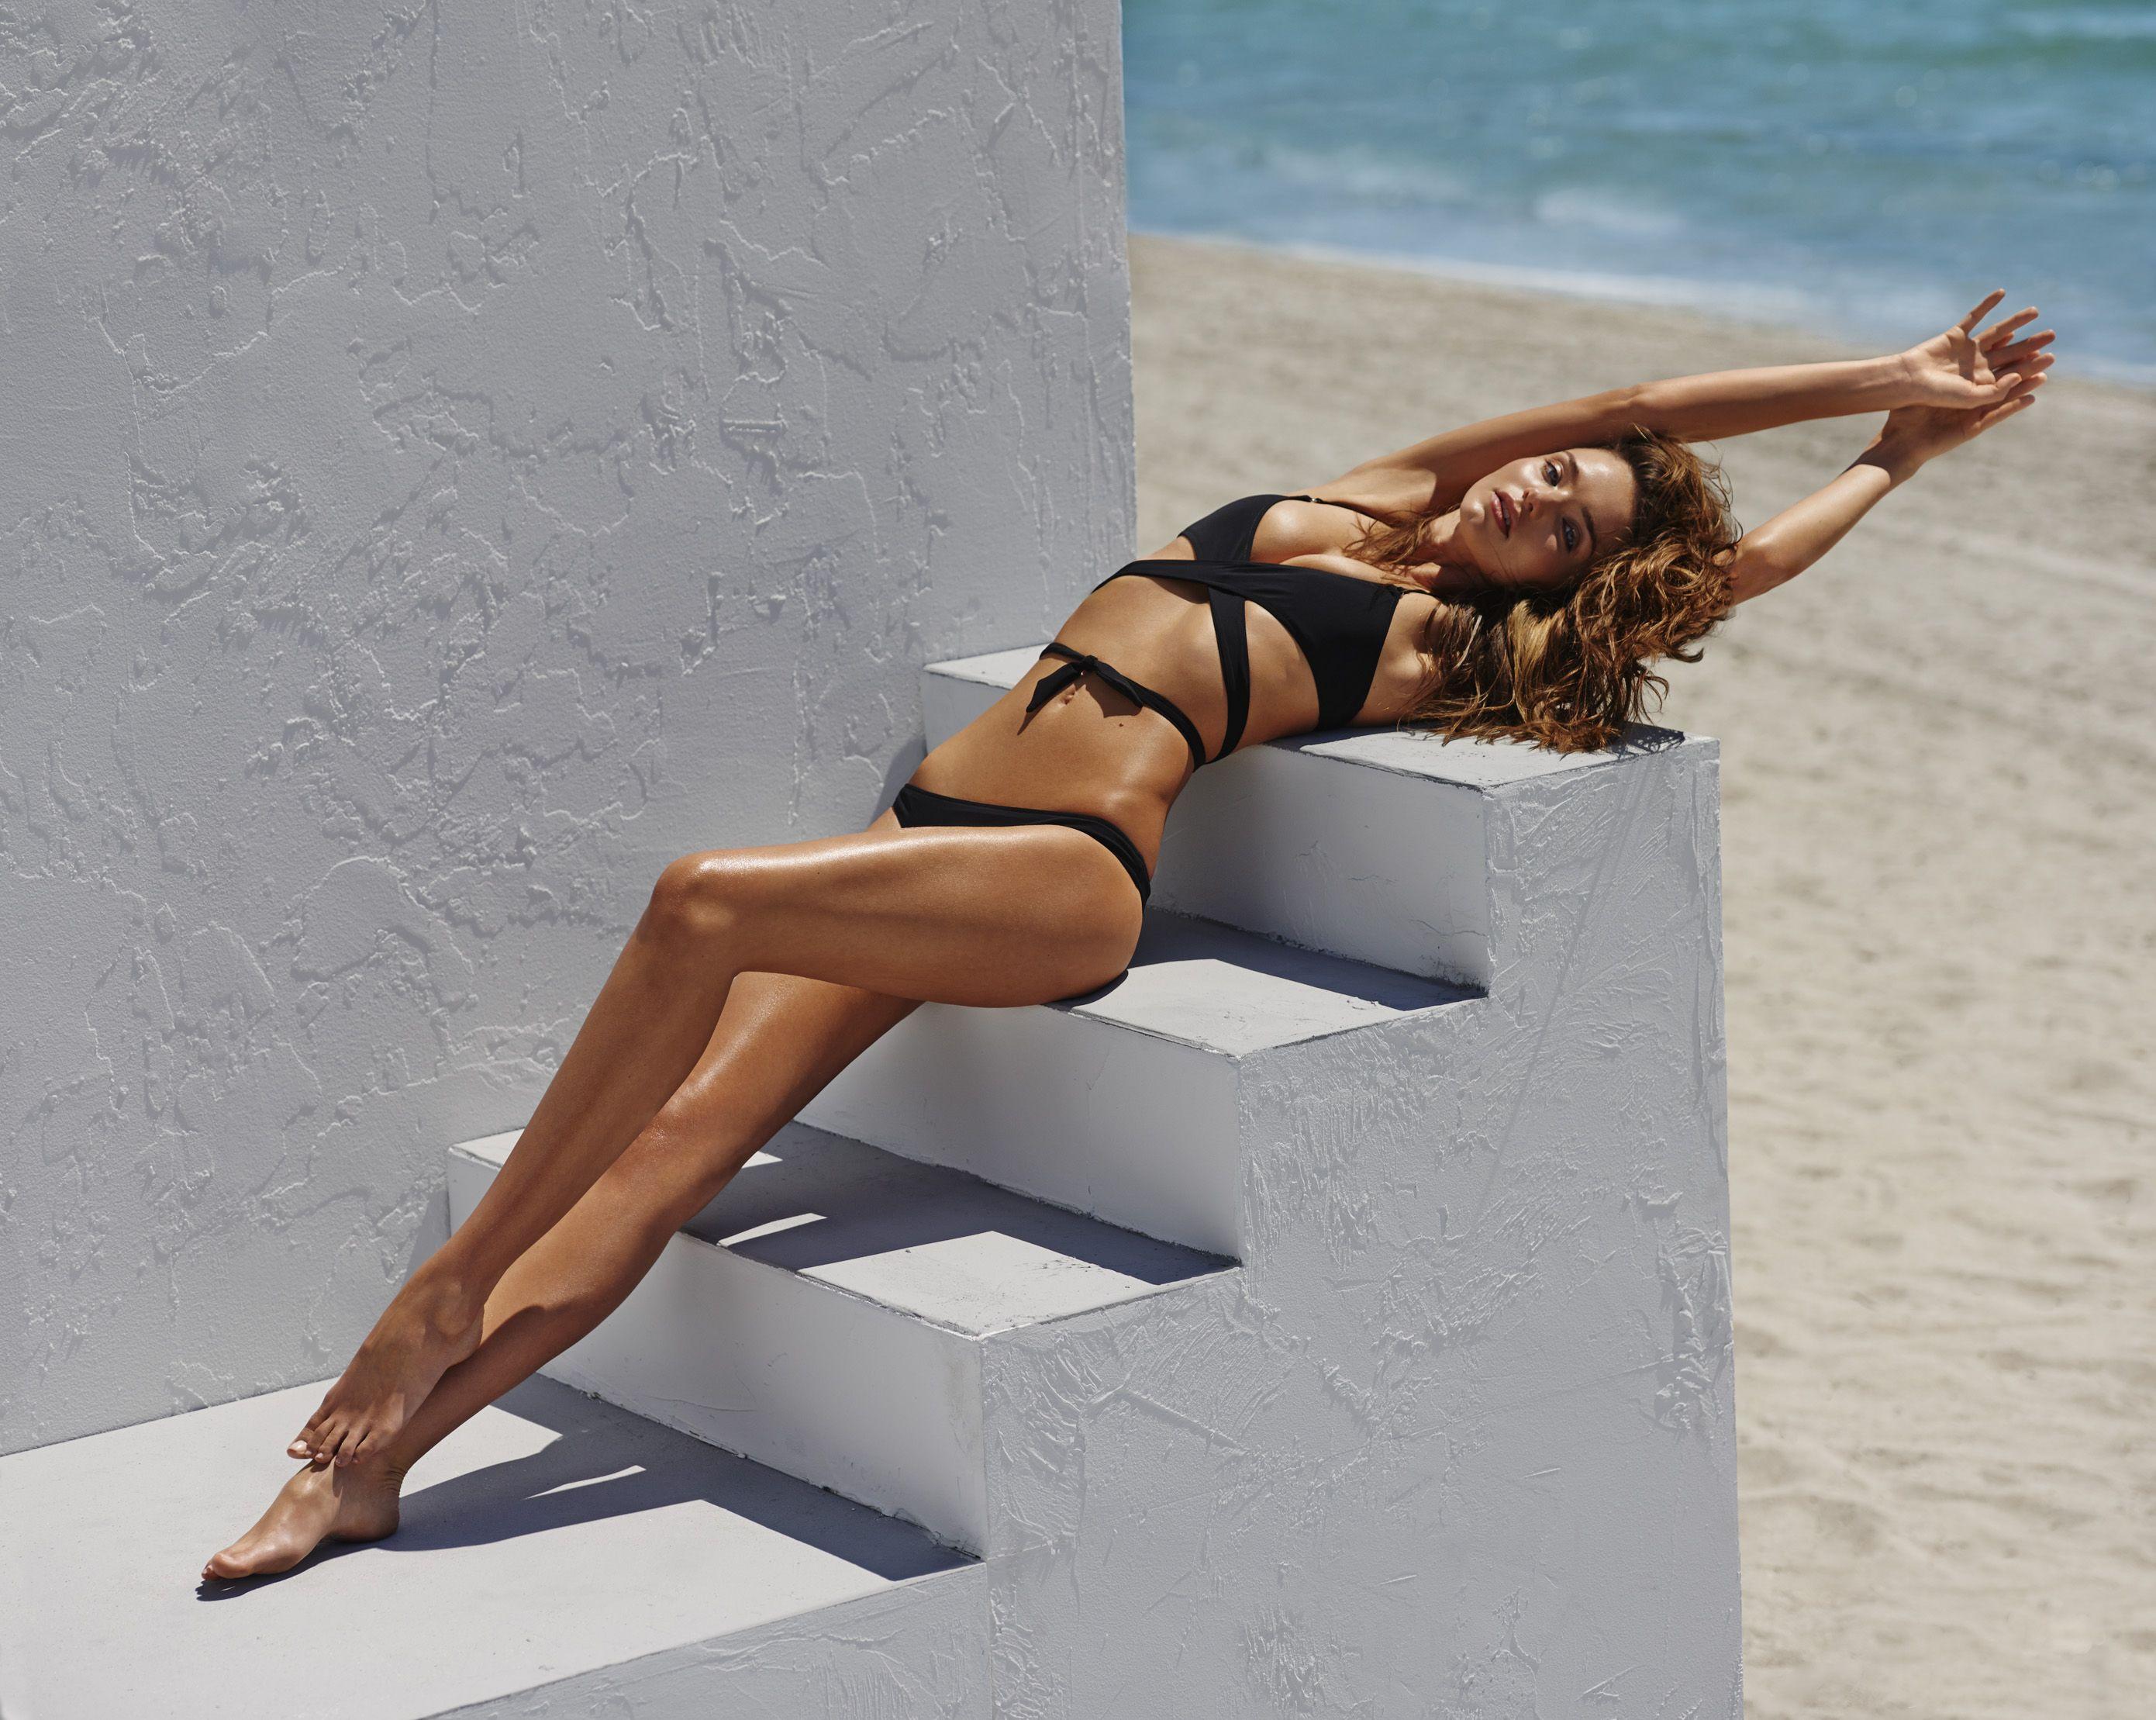 fc192b696 Miranda Kerr Slips Into Swimwear and Spills Her Secrets to The Edit ...